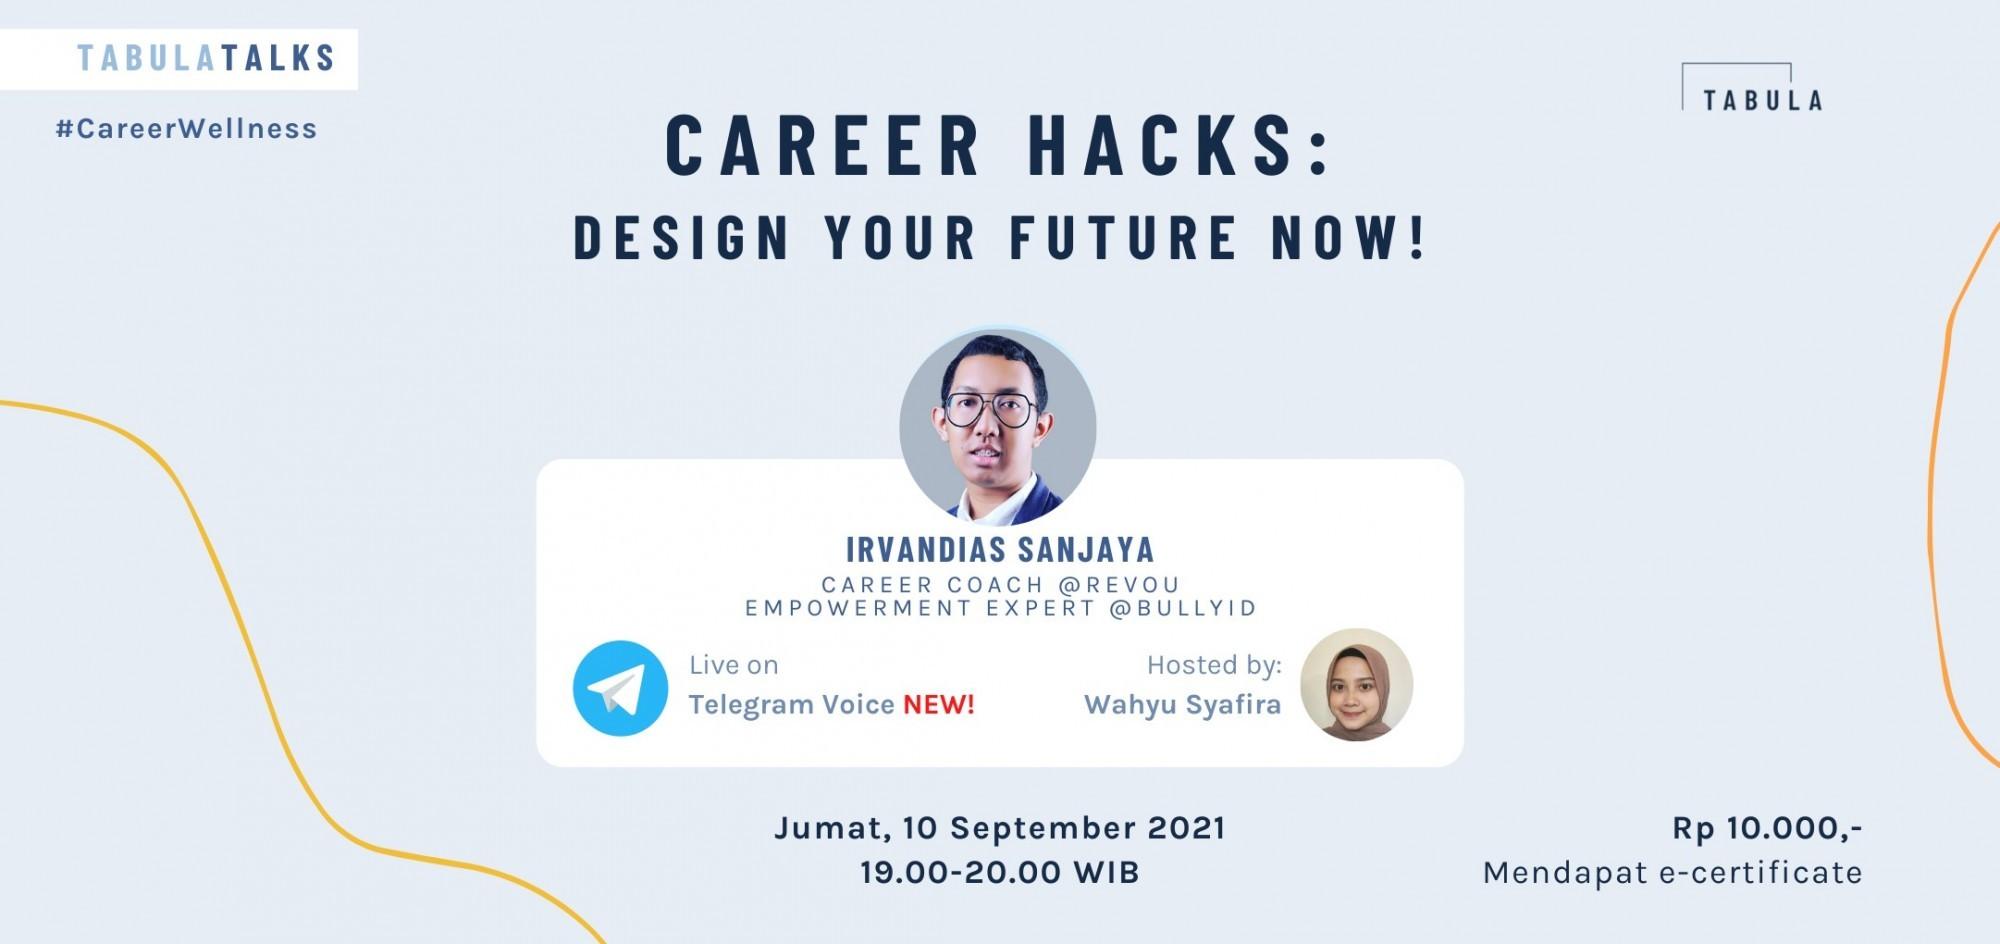 Career Hacks: Design Your Future Now!